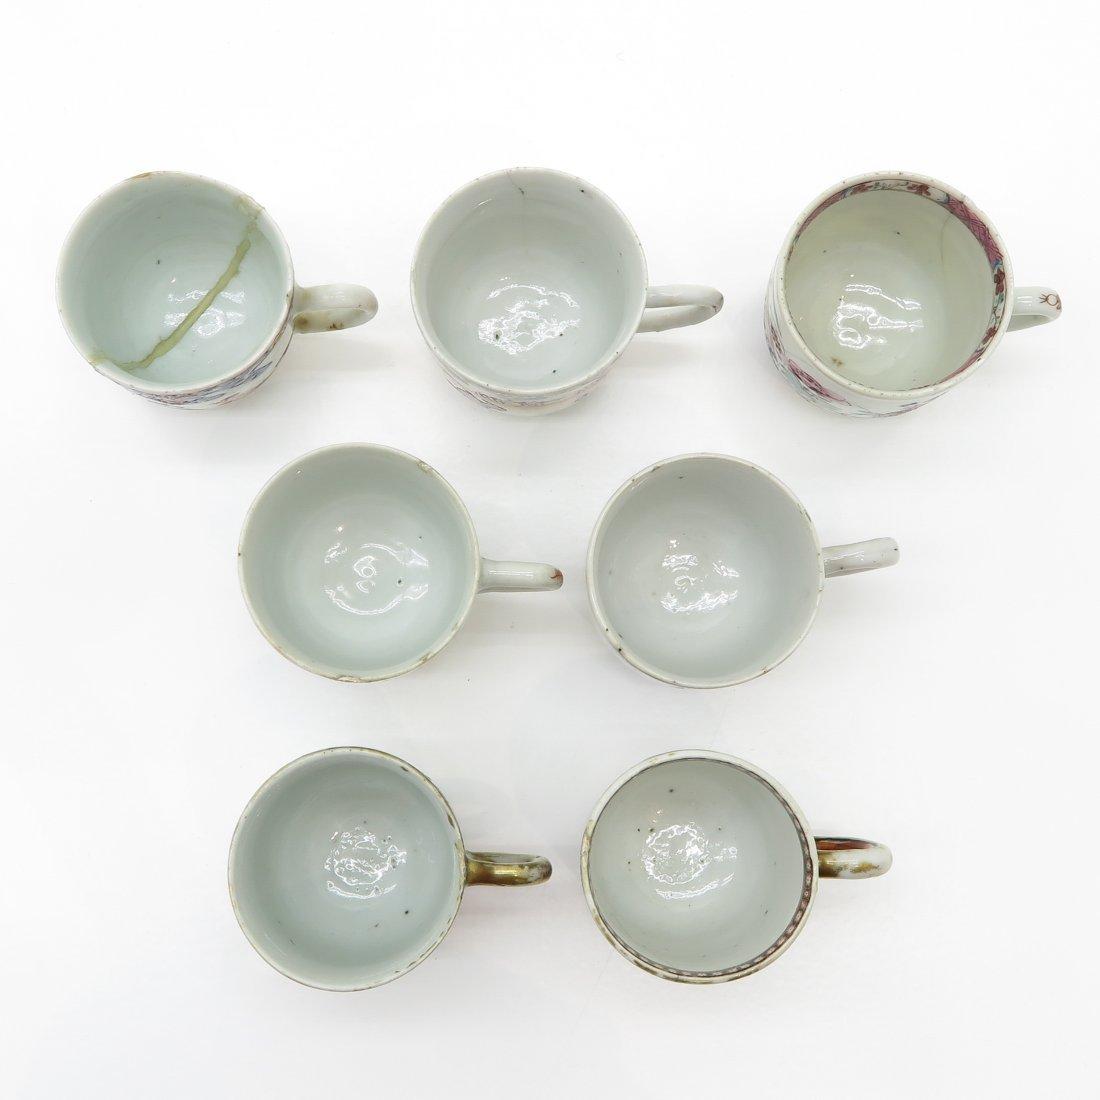 Lot of Mandarin Decor China Porcelain Cups - 2